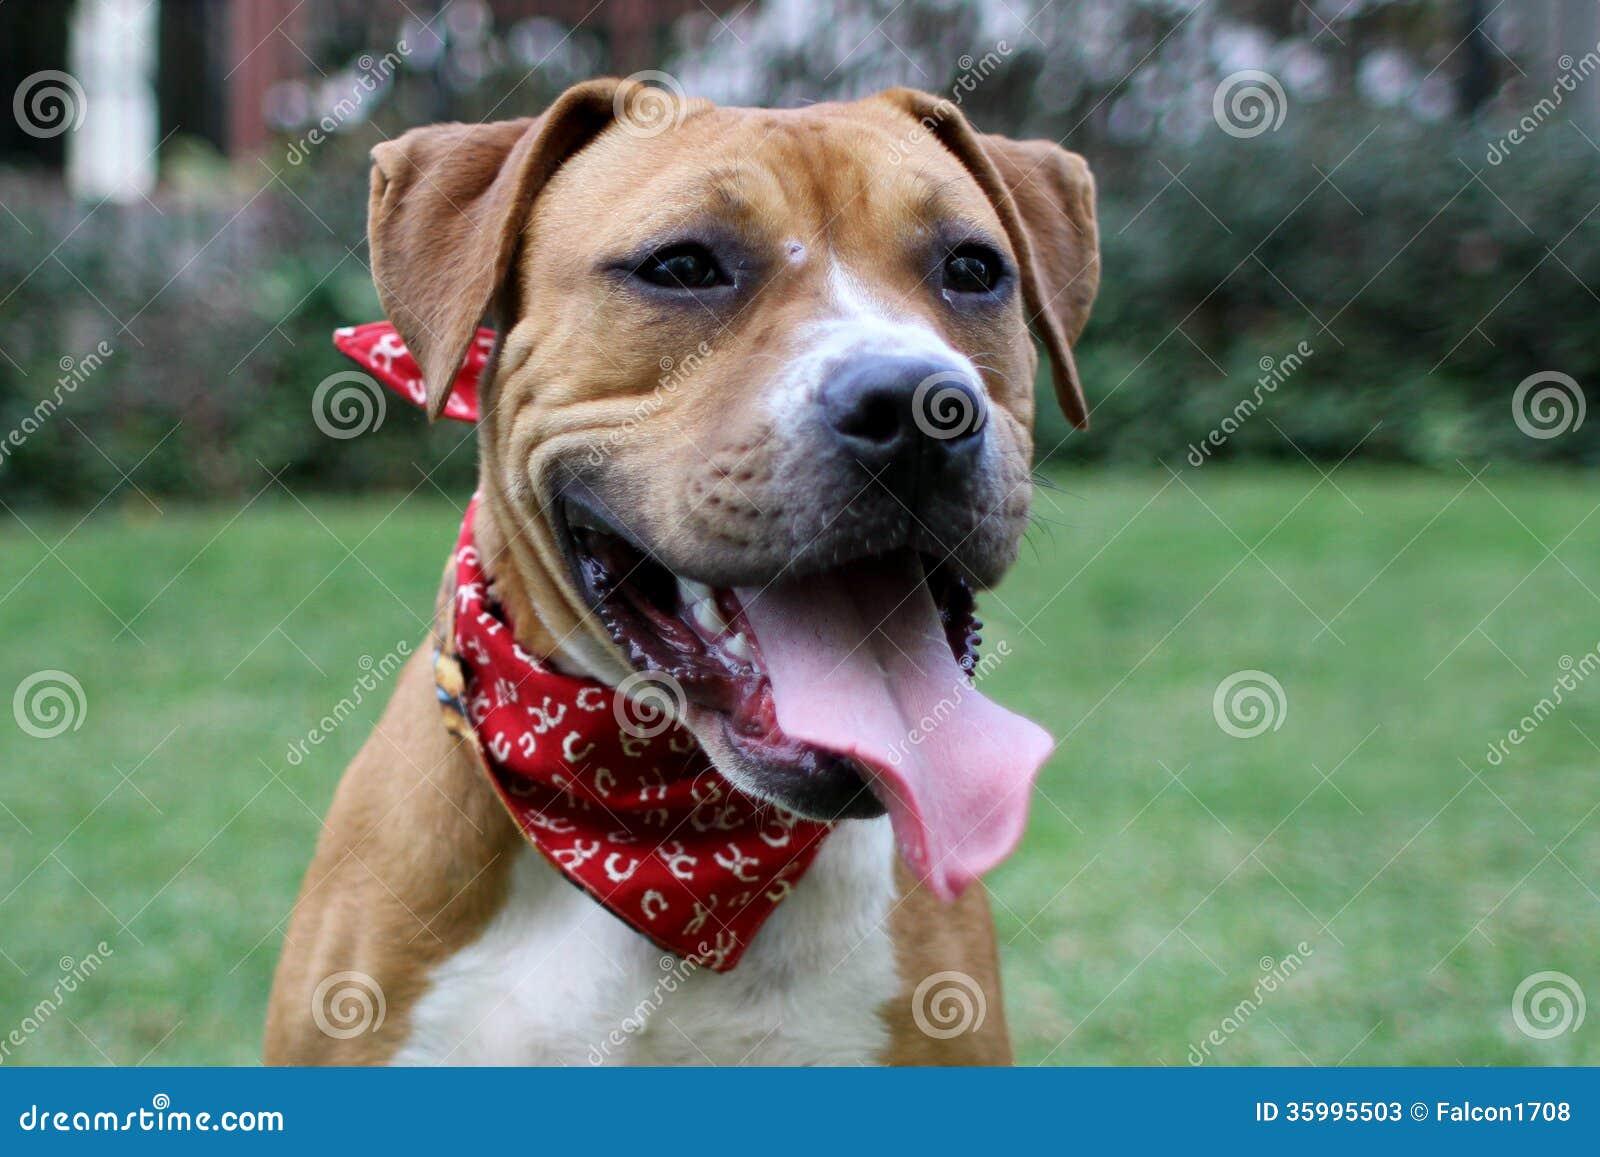 Boxer And Pitbull Mix Stock Photos - Image: 35995503